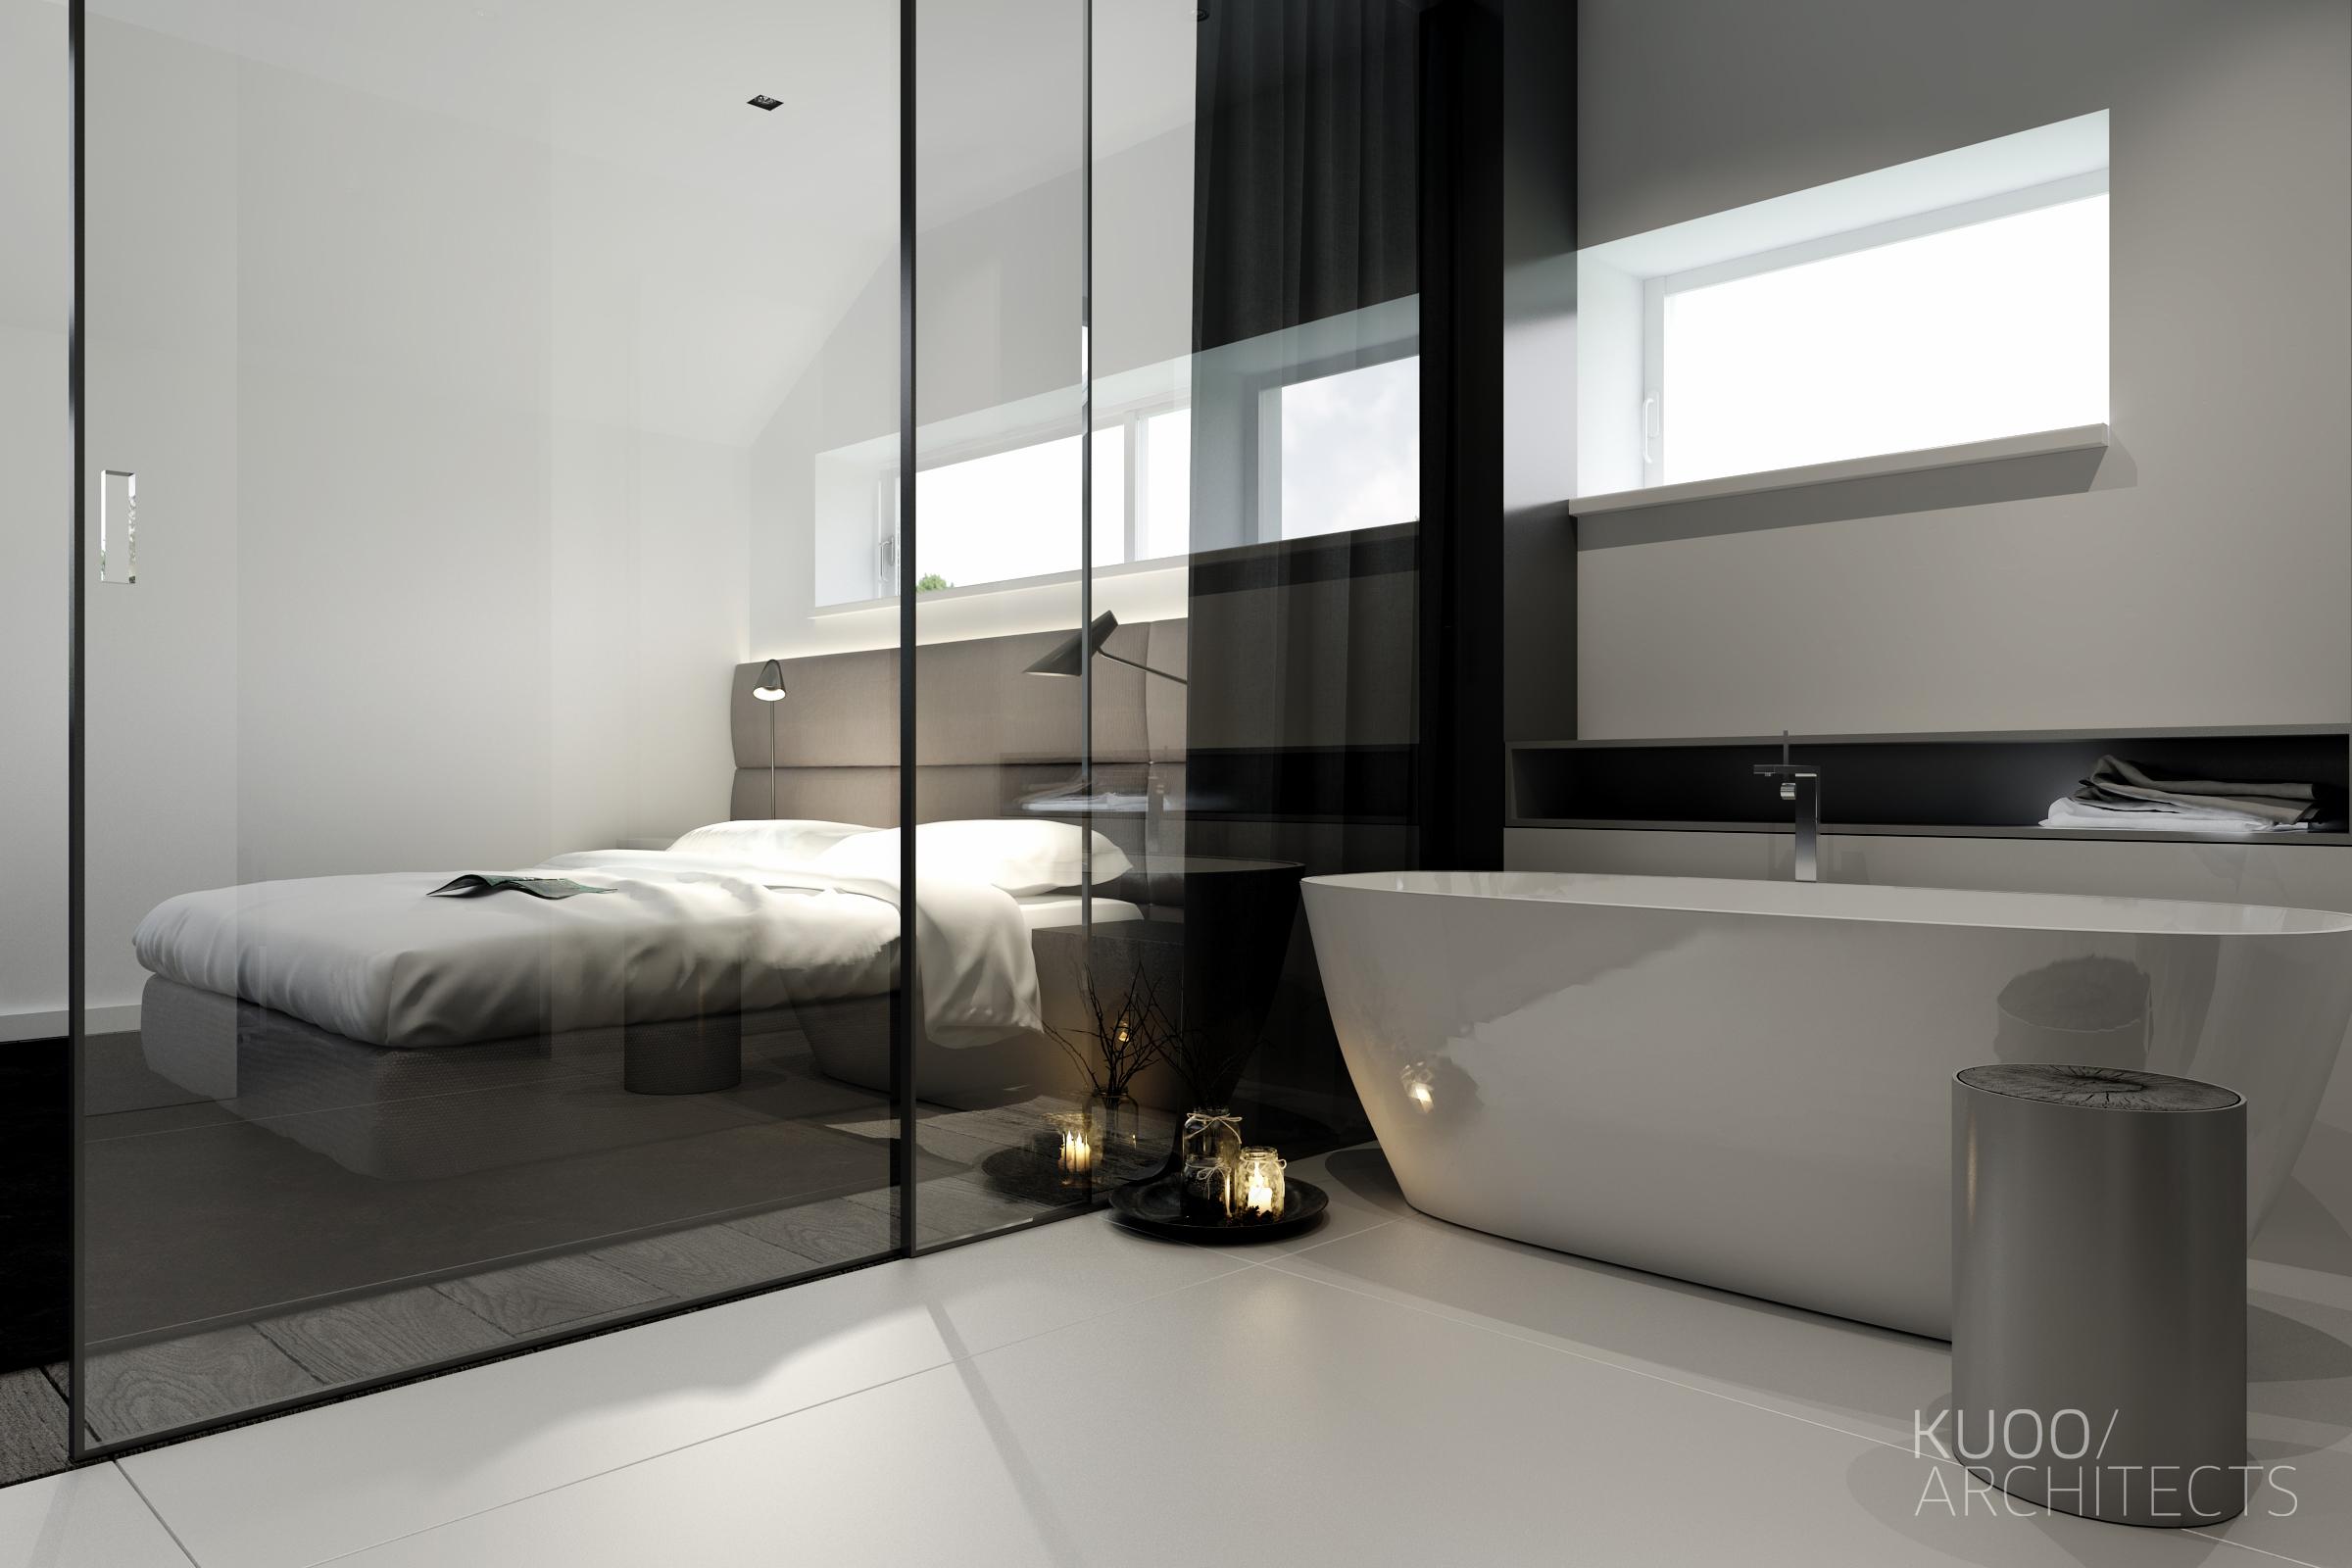 kuoo_architects_interior_design_minimal_contemporary (34) logo